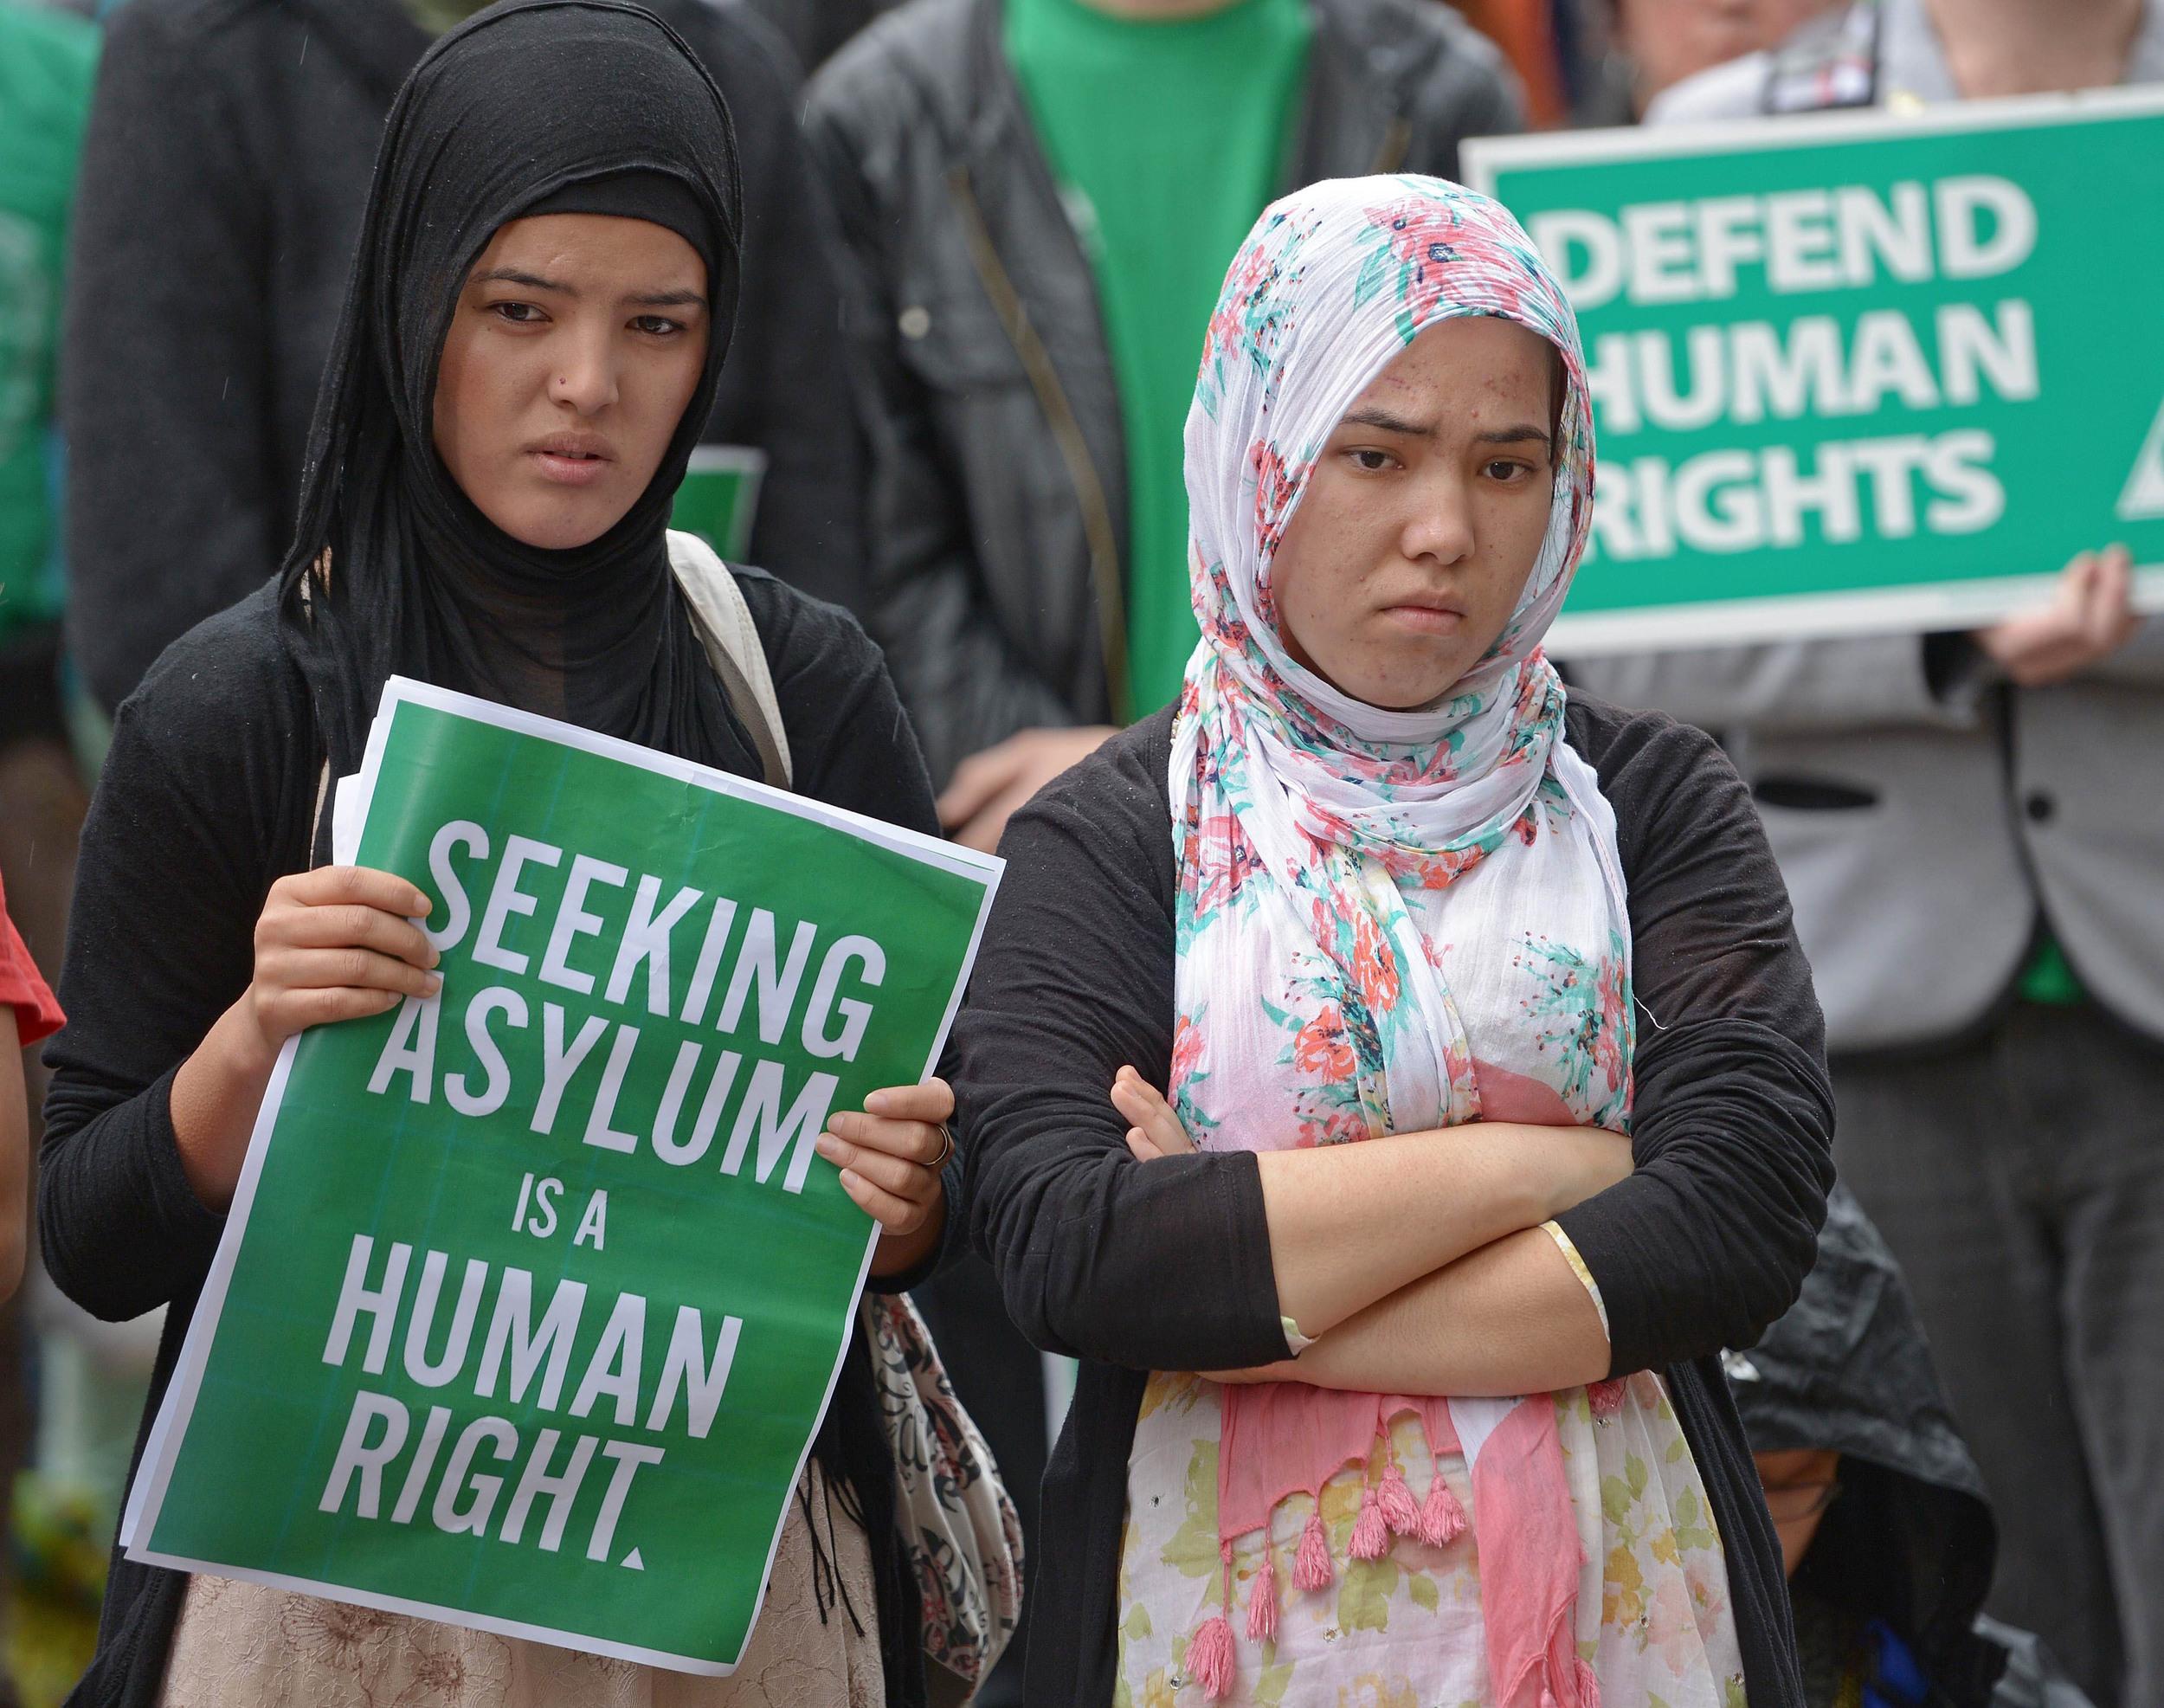 asylum 1 year ban immigration lawyer seattle.jpg